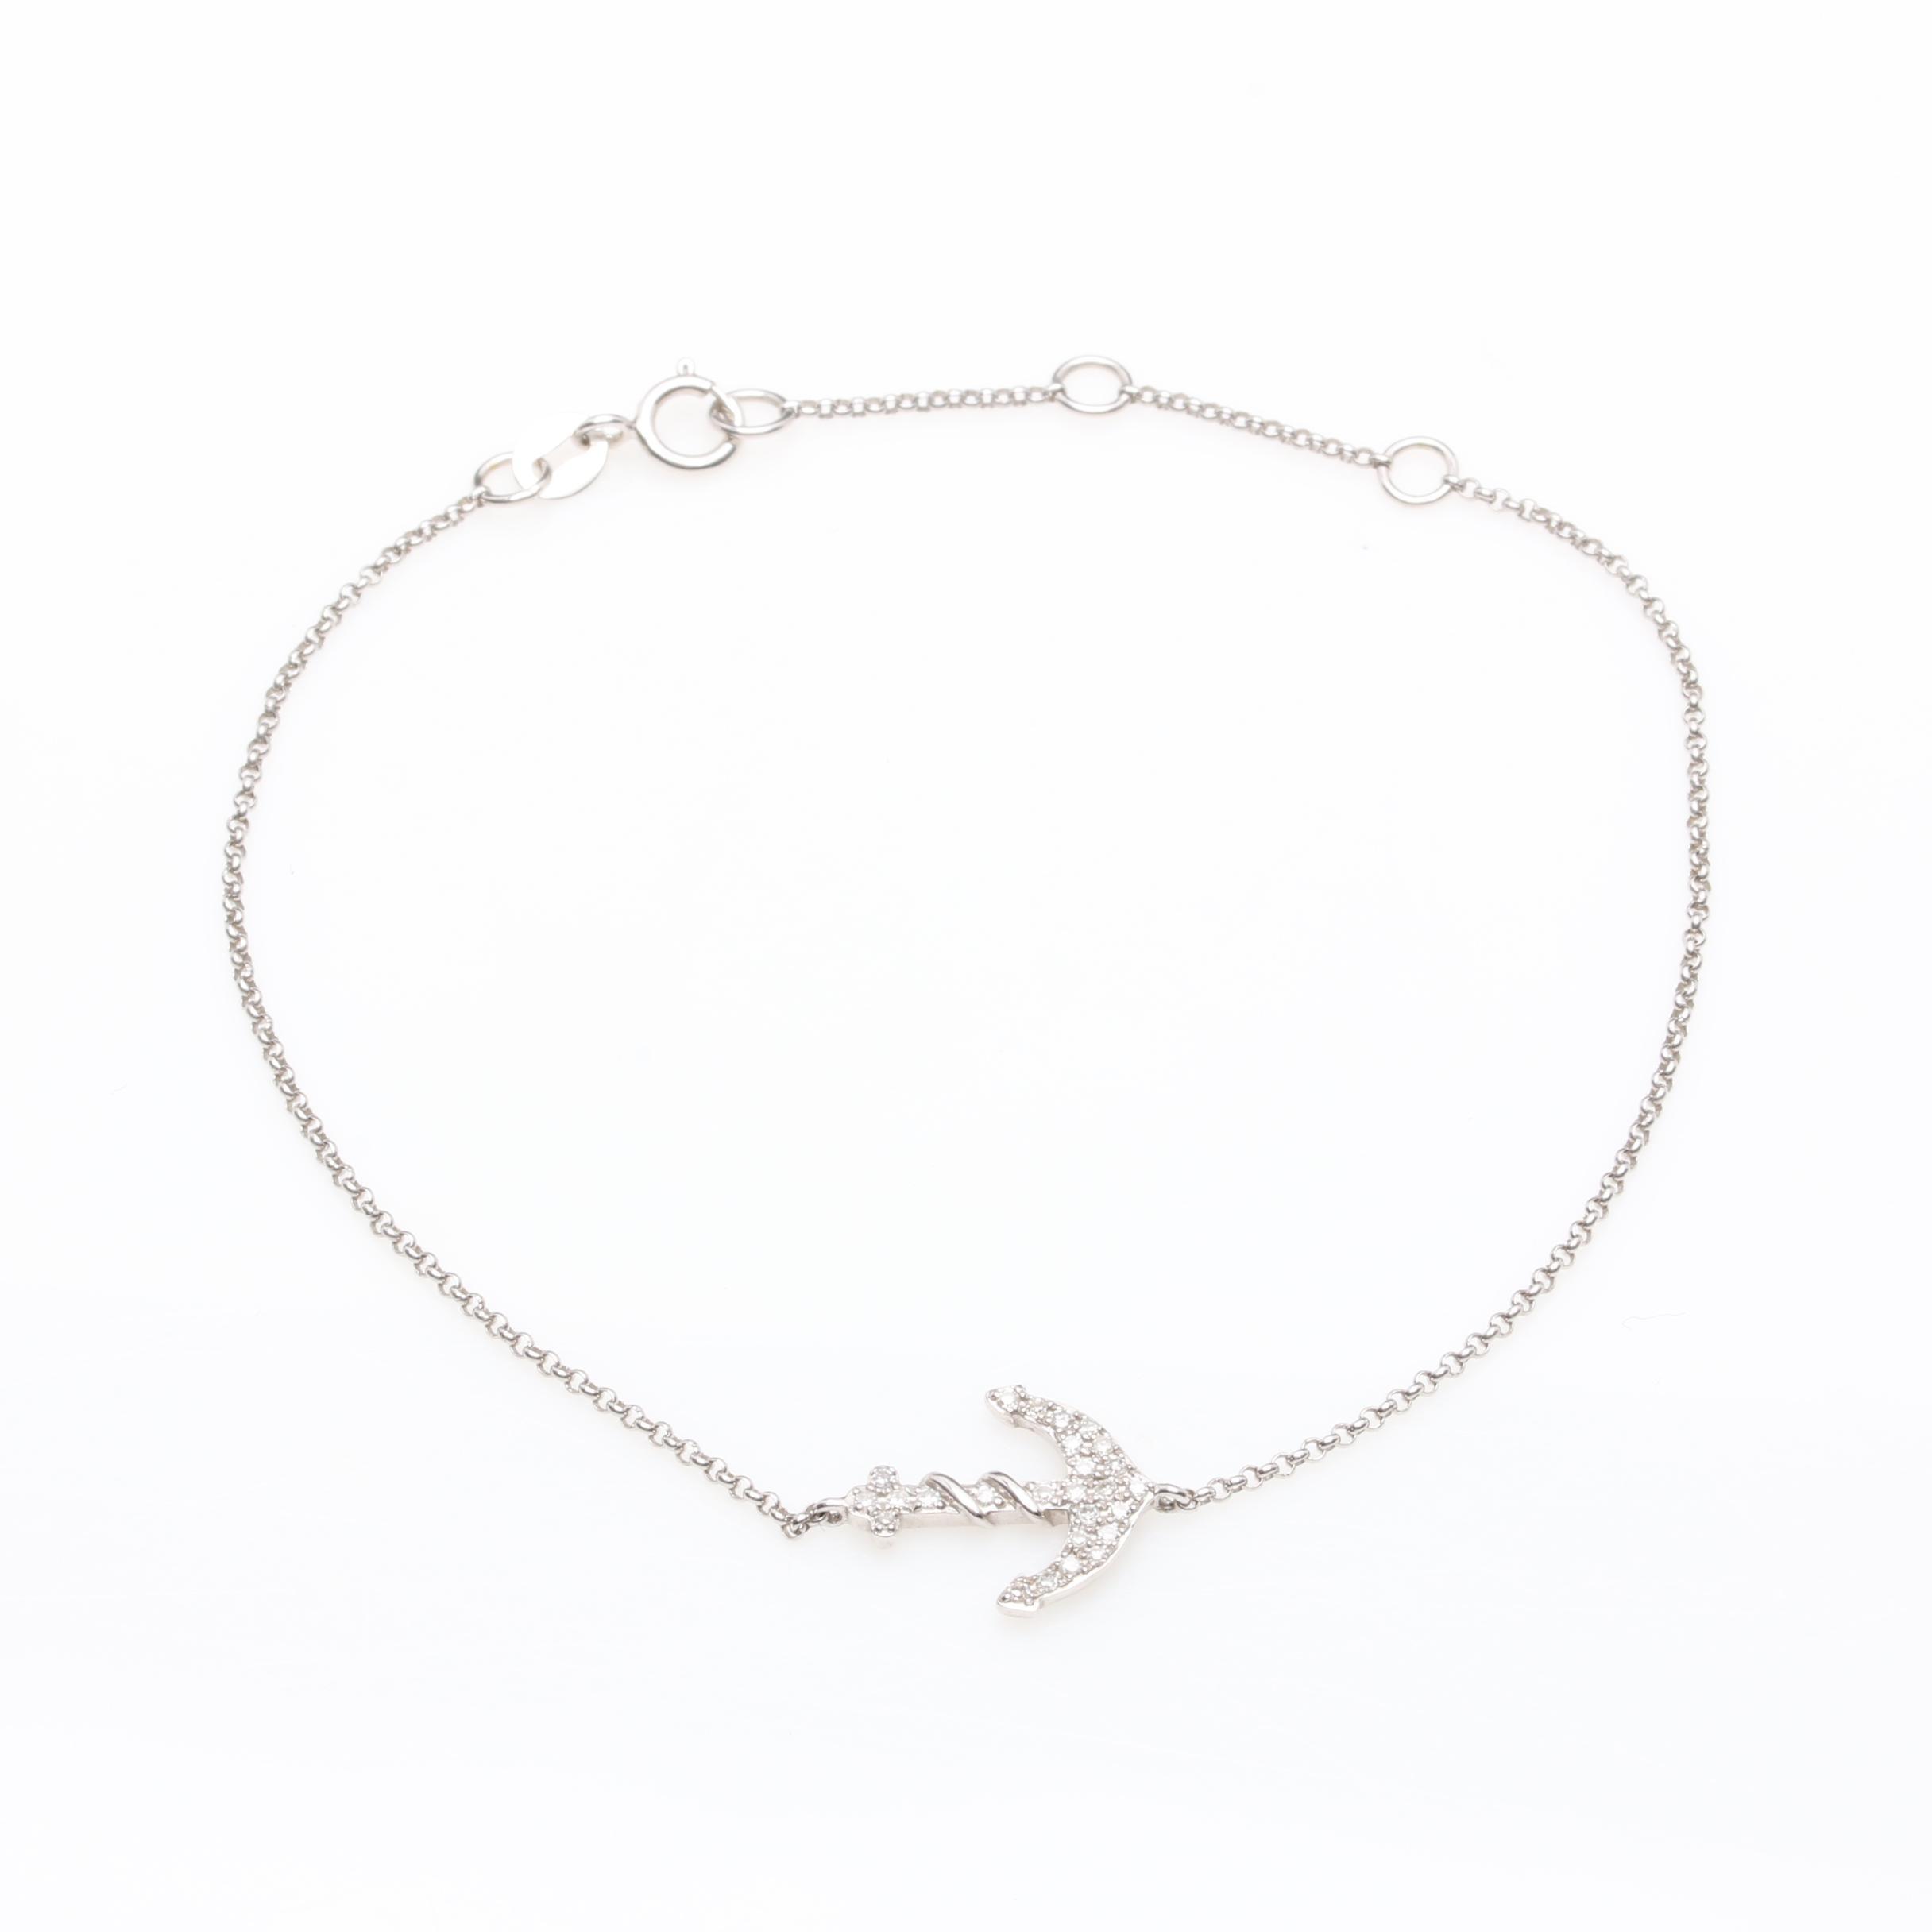 Effy 14K White Gold Diamond Anchor Bracelet